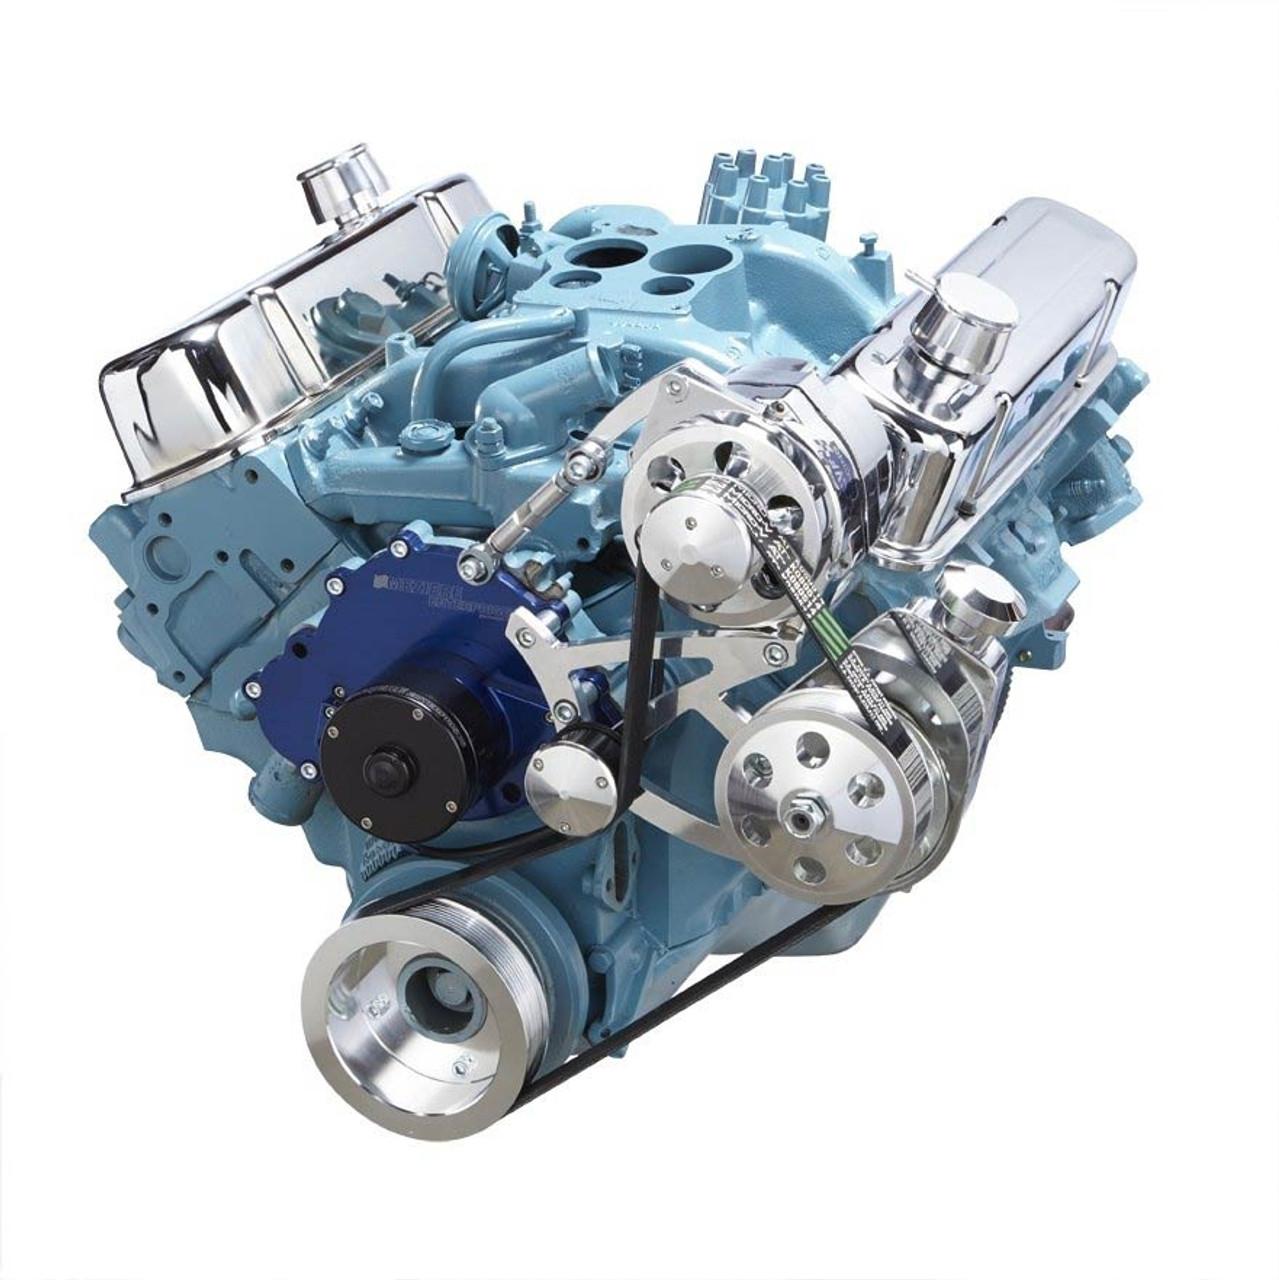 pontiac serpentine conversion kit for electric water pump with power rh cvfracing com Pontiac Vacuum Diagram Pontiac V6